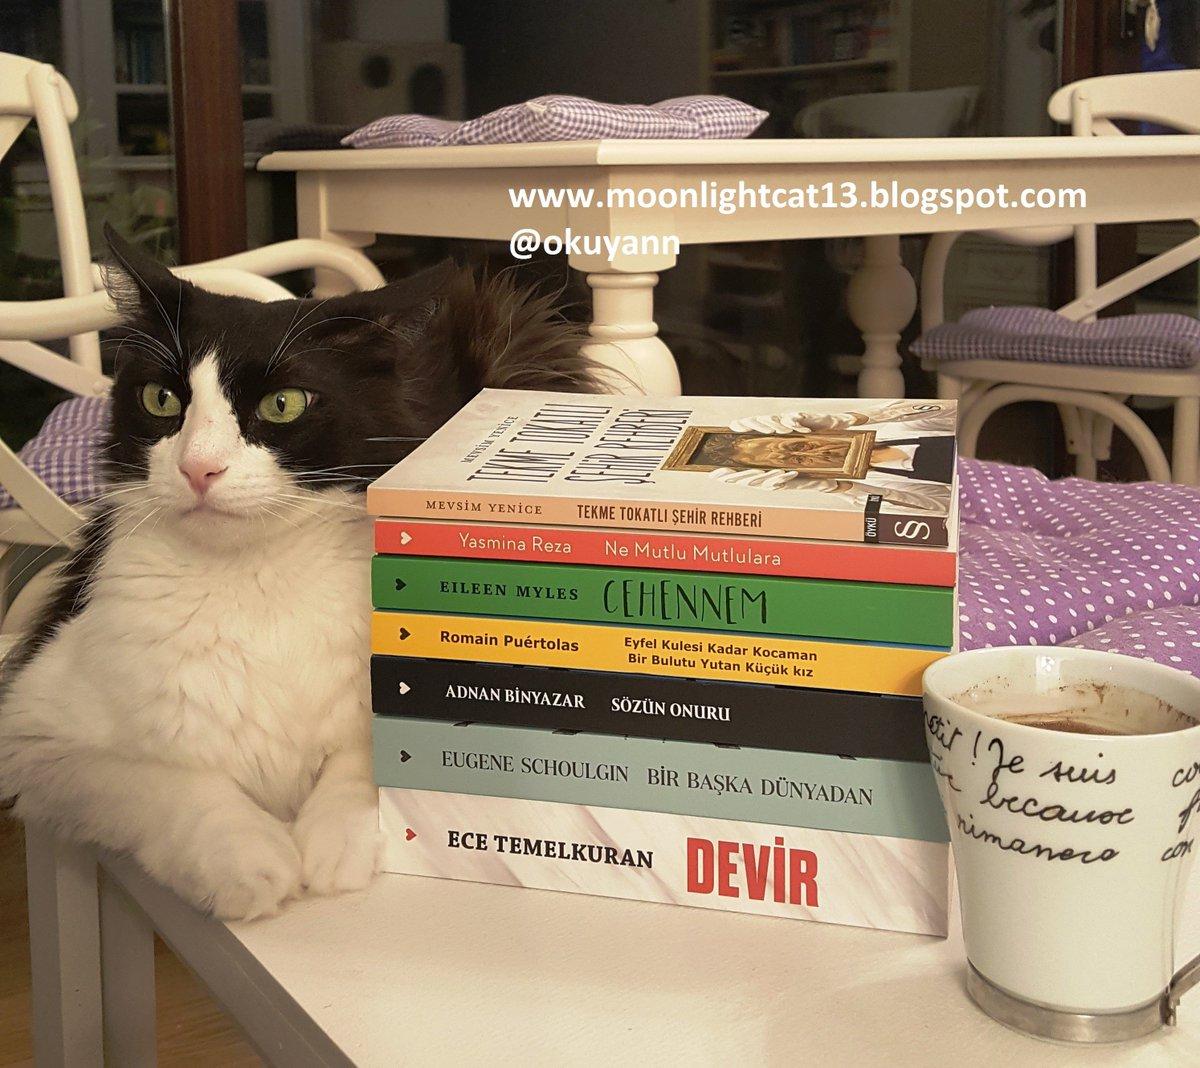 @canyayinlari @DRdunyasi  7 TL Kampanyası - tüm kitaplar blogumda:  #kitap #canyayinlari #kitapkampanya #blogger #kedi #cat